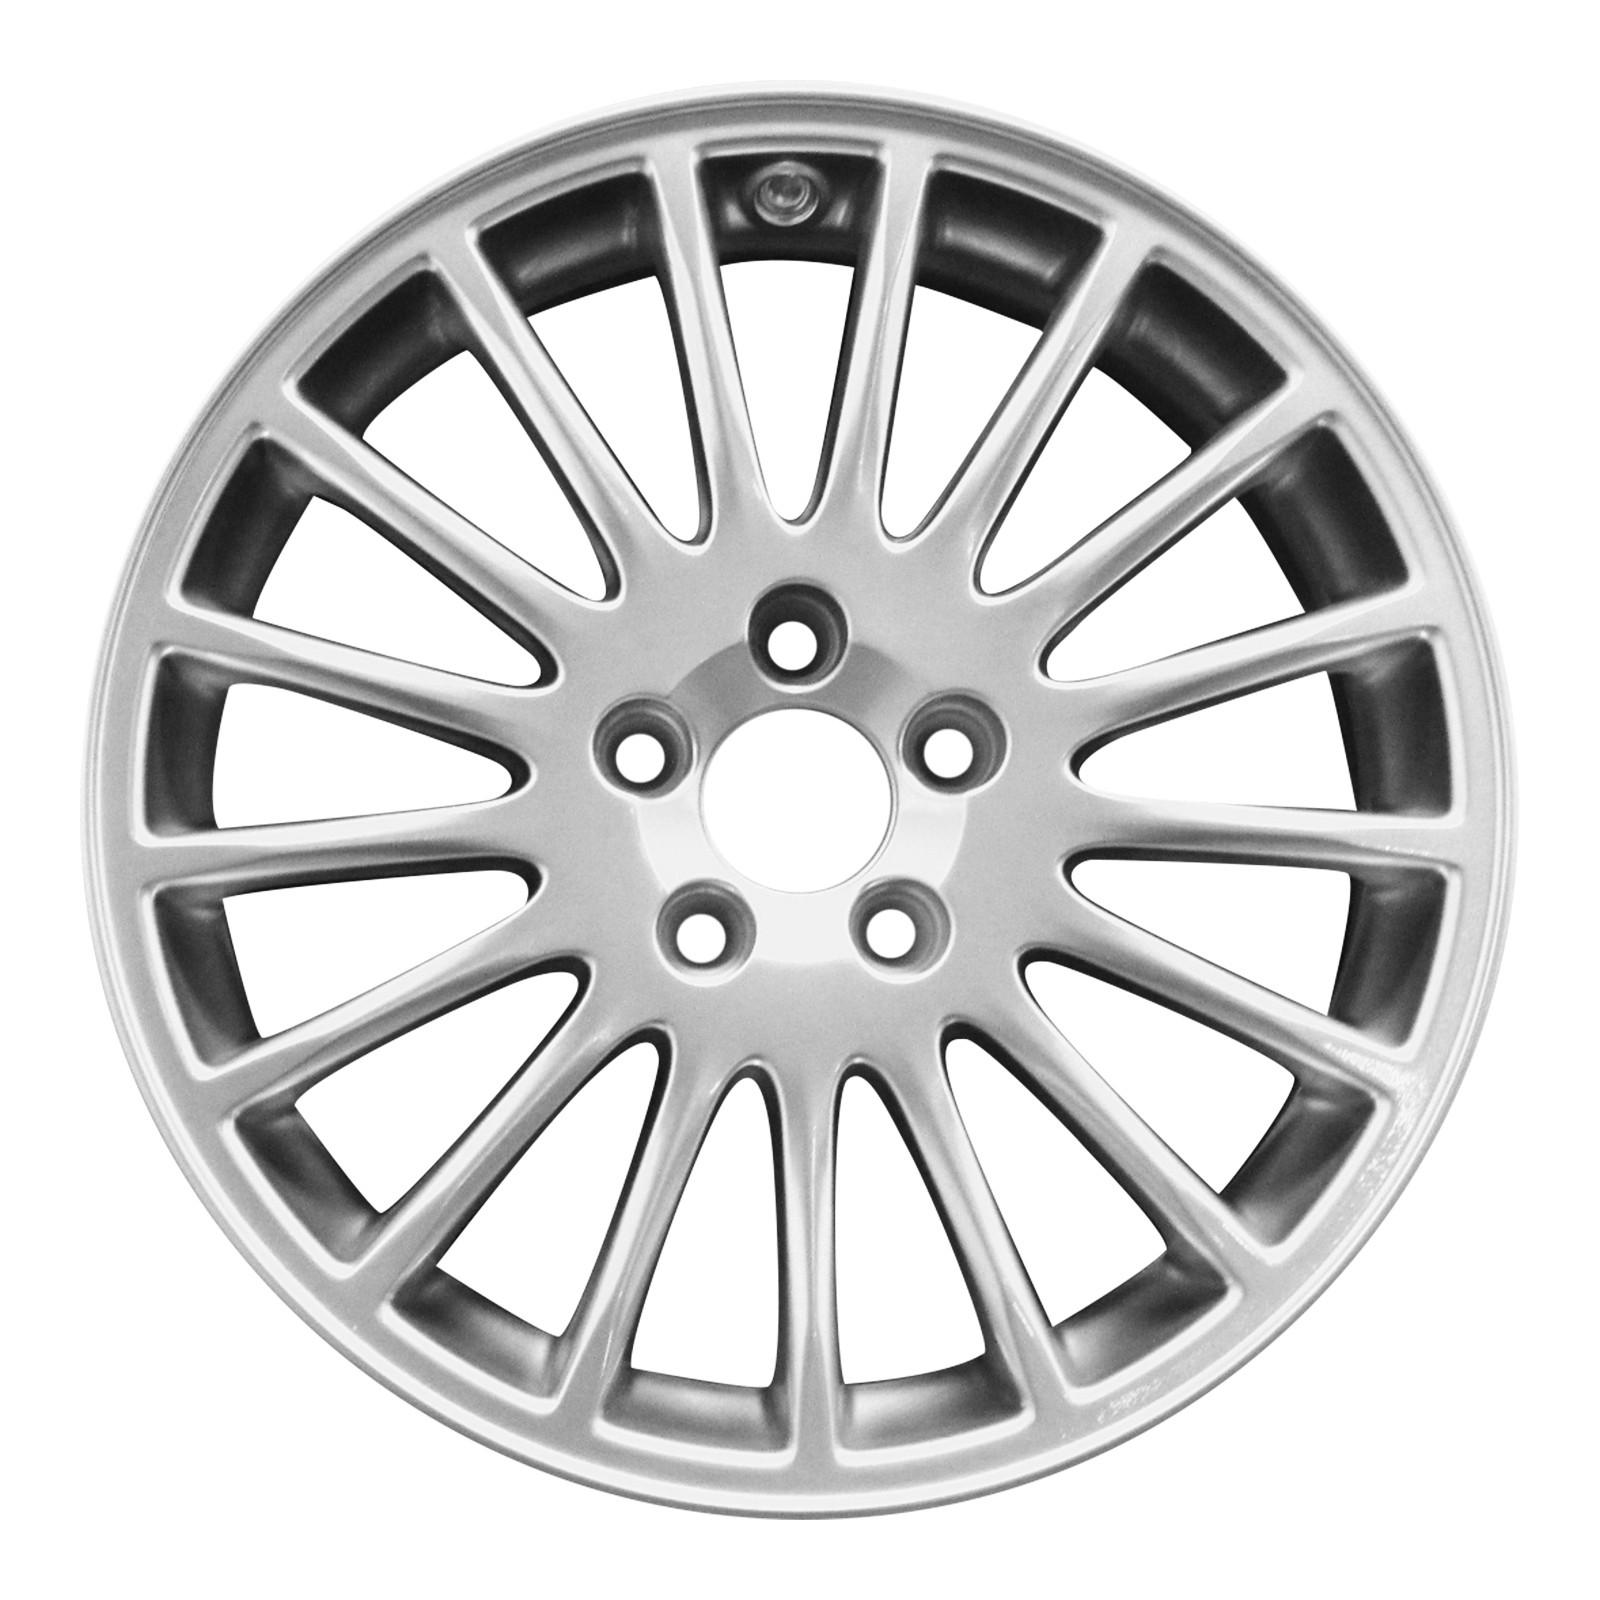 Volvo Oem 17 X 7 5 Aluminum Alloy Wheel Tethys Rim 8633140 Genuine Volvo Wheels